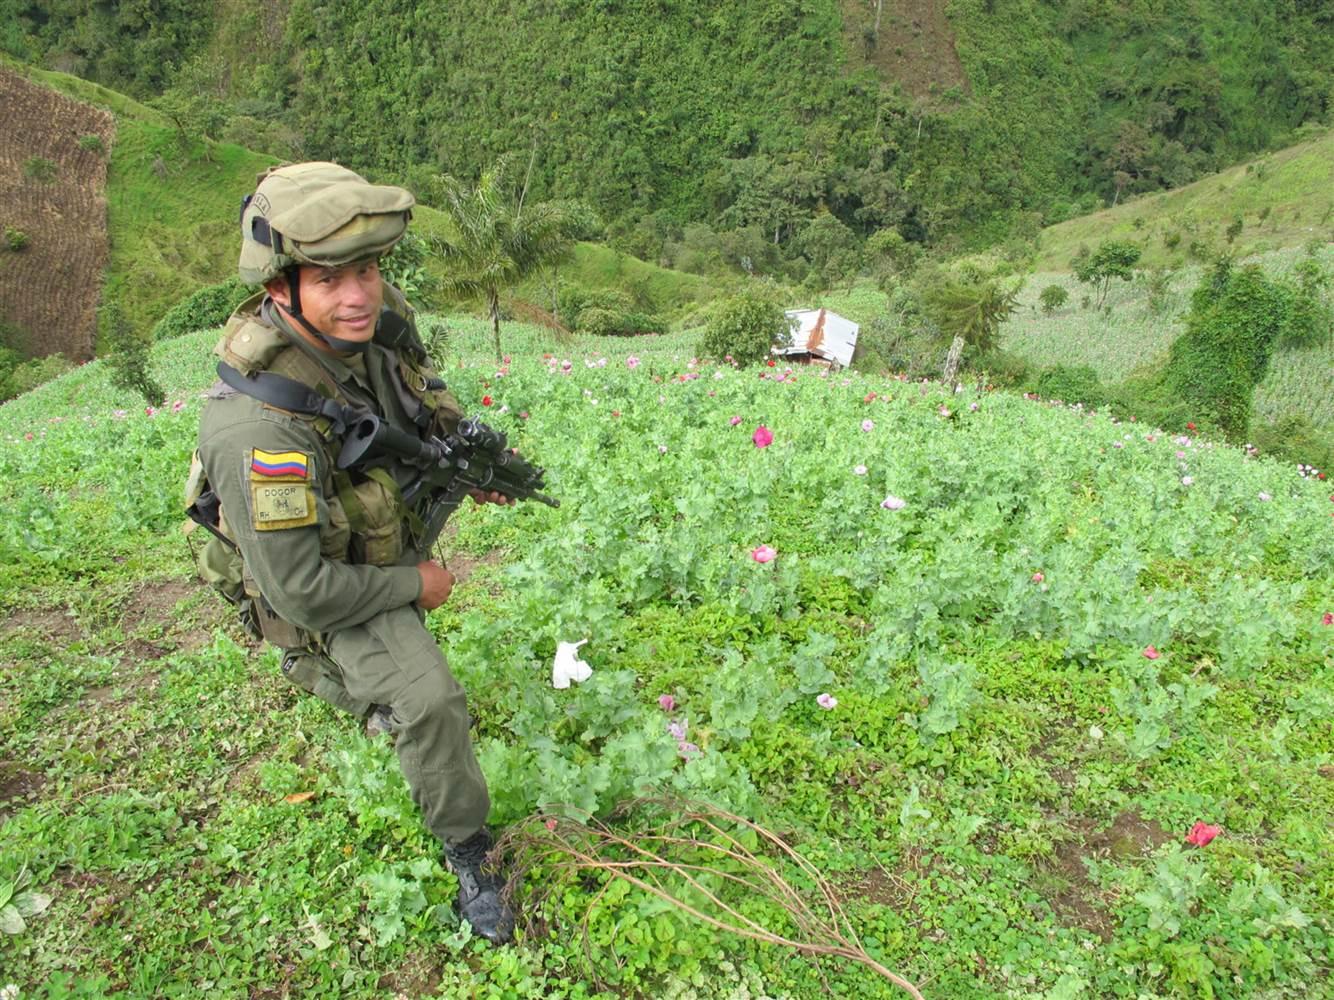 Colombia - Página 20 141118-columbia-heroin-police-arp-1007a_3026376a74c45d46481b41dc2c547c23.nbcnews-ux-2880-1000